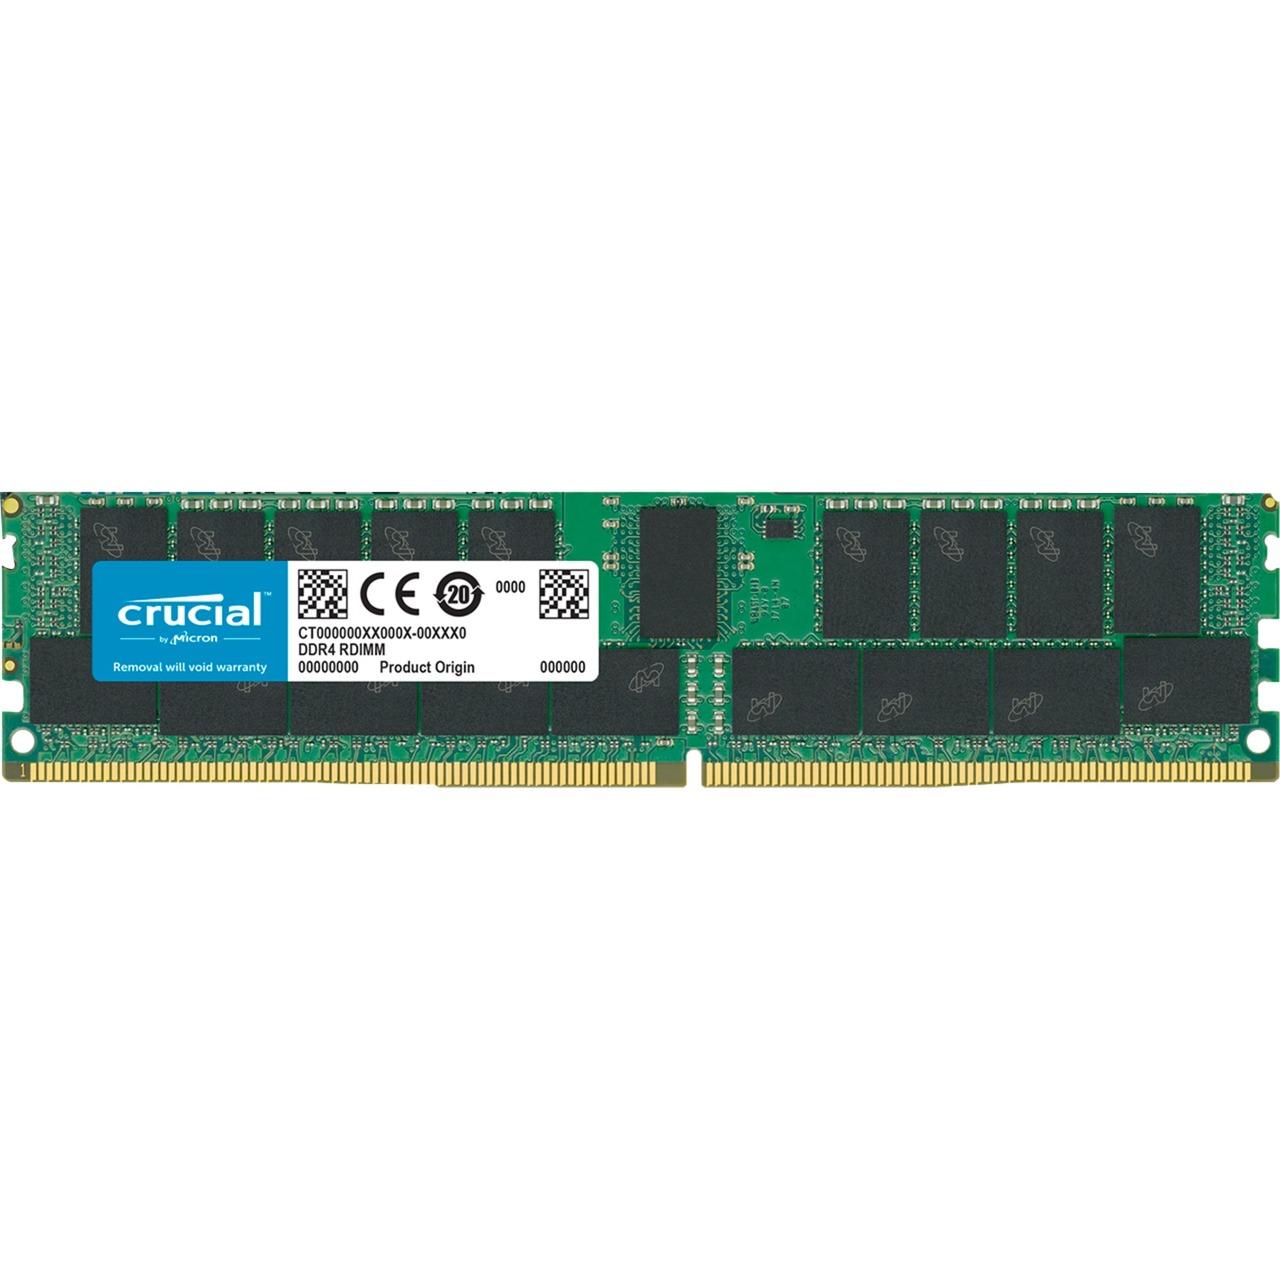 32GB DDR4-2666 RDIMM 32GB DDR4 2666MHz ECC módulo de memoria, Memoria RAM